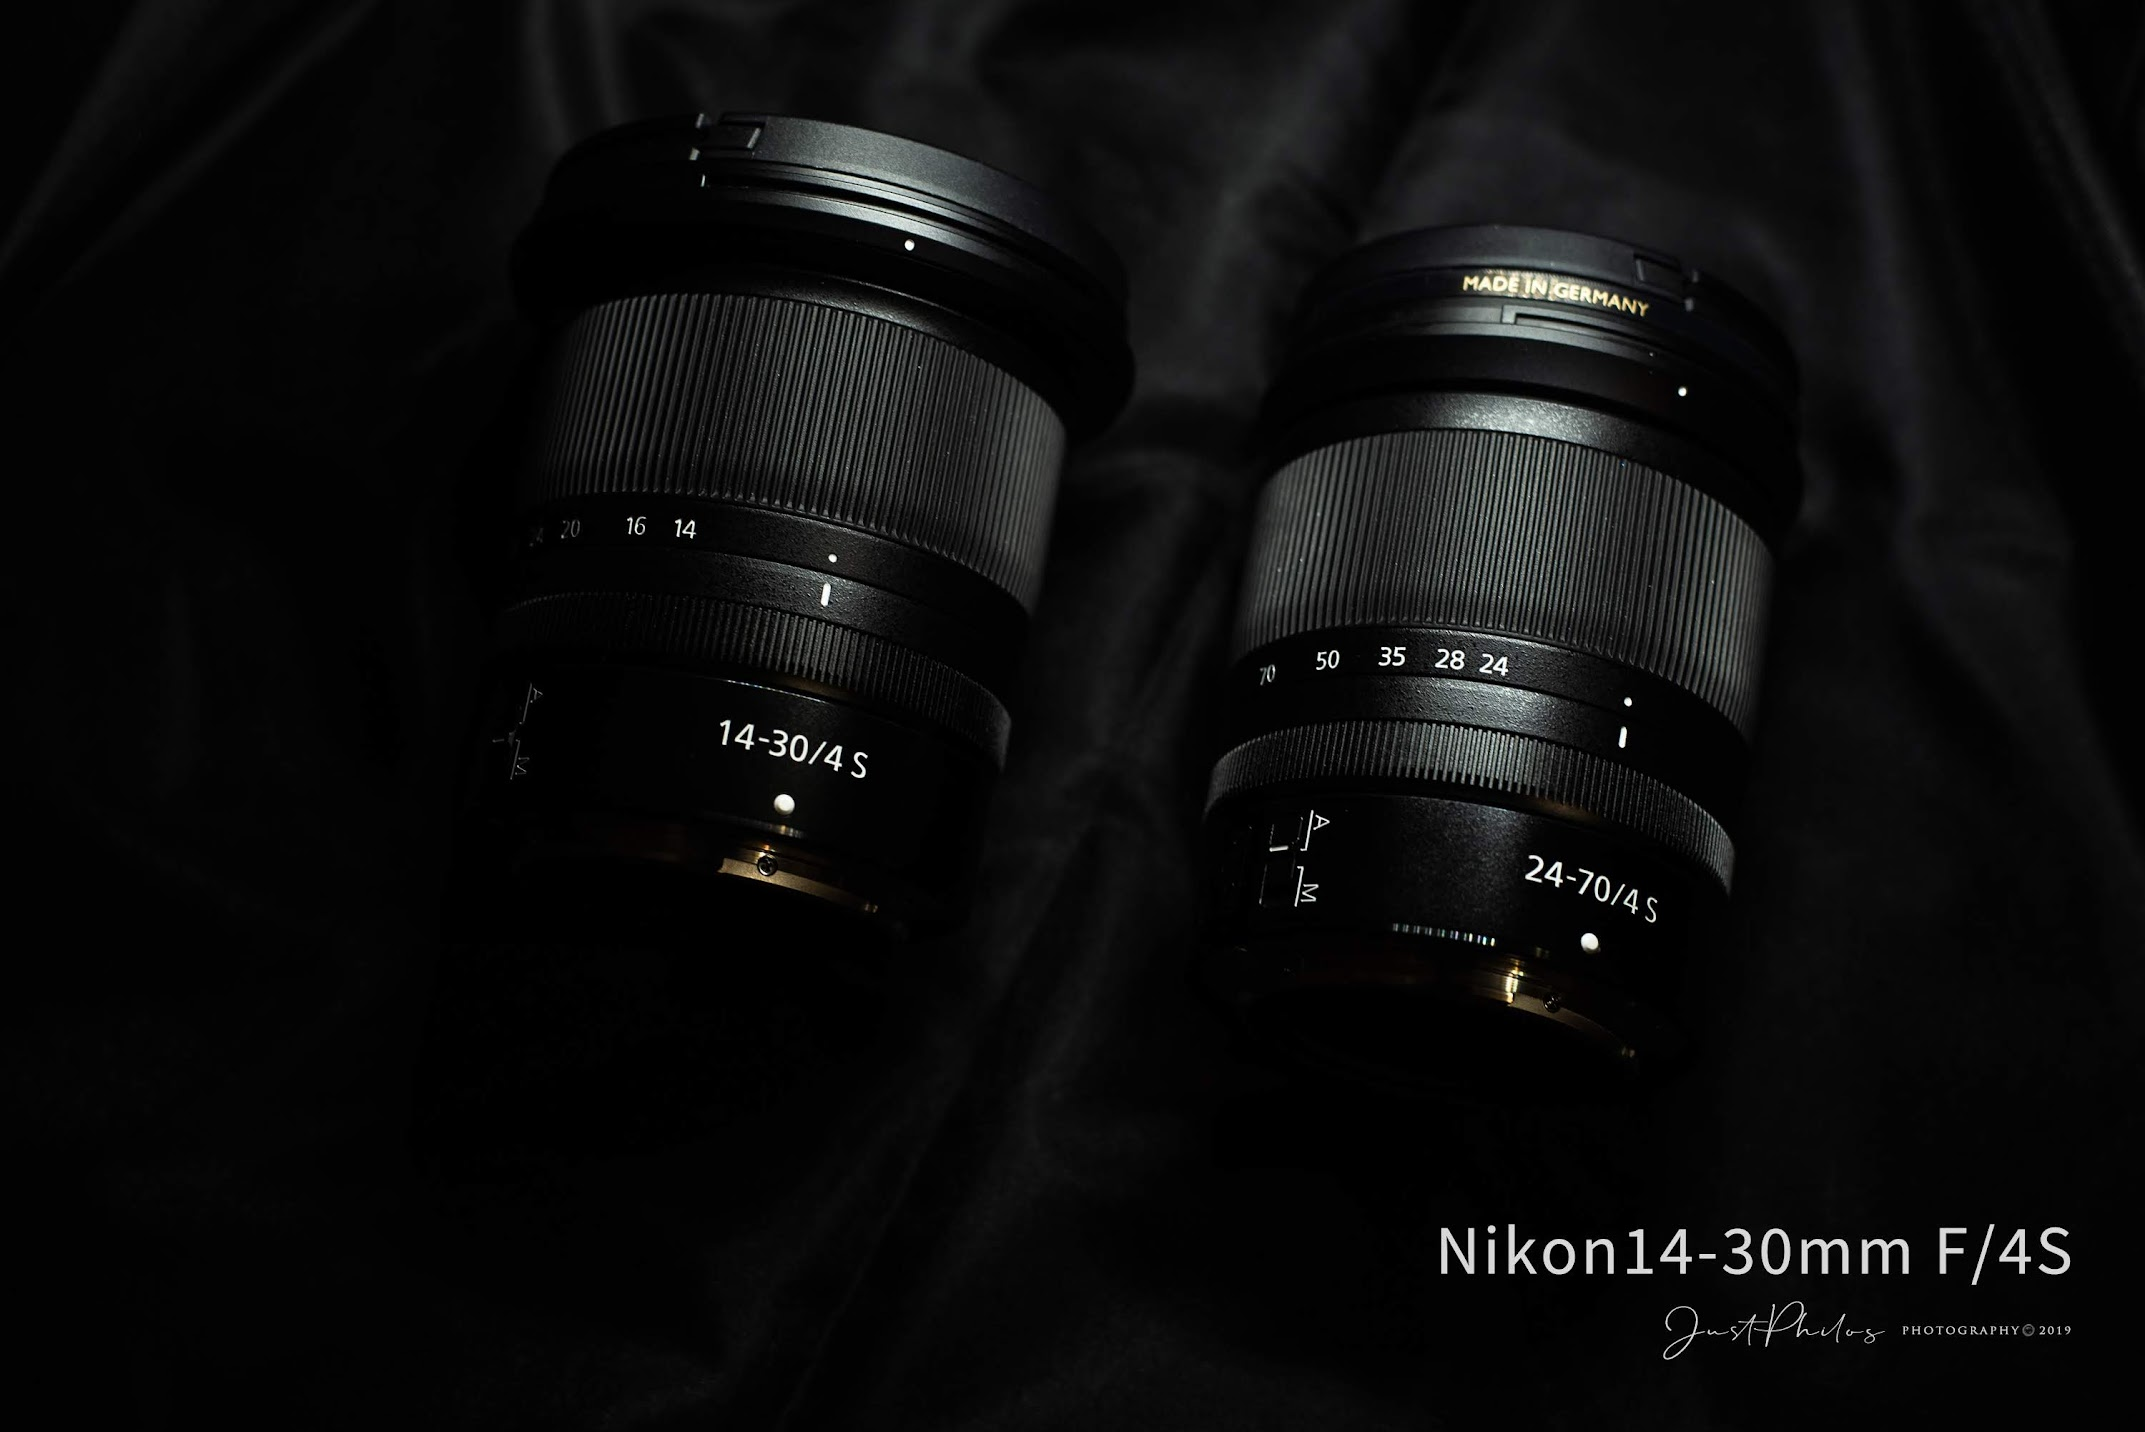 Nikon Z 14-30mm F/4S的鏡身長度幾乎與Nikon Z 24-70mm F/4S相同,兩顆都是很推薦的Z鏡頭。